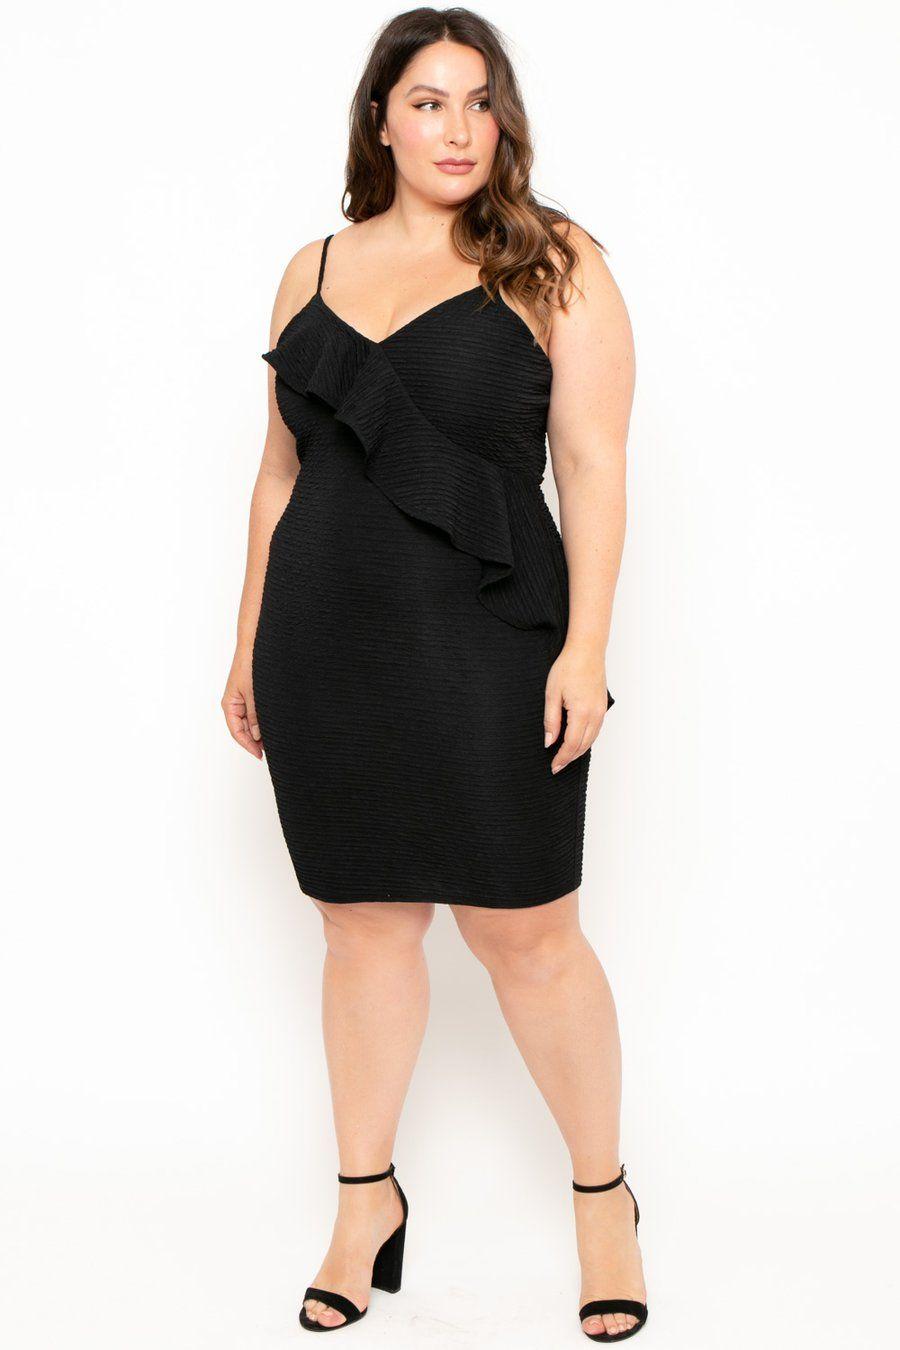 Plus Size Cascade Ruffle Dress Black Trendy plus size